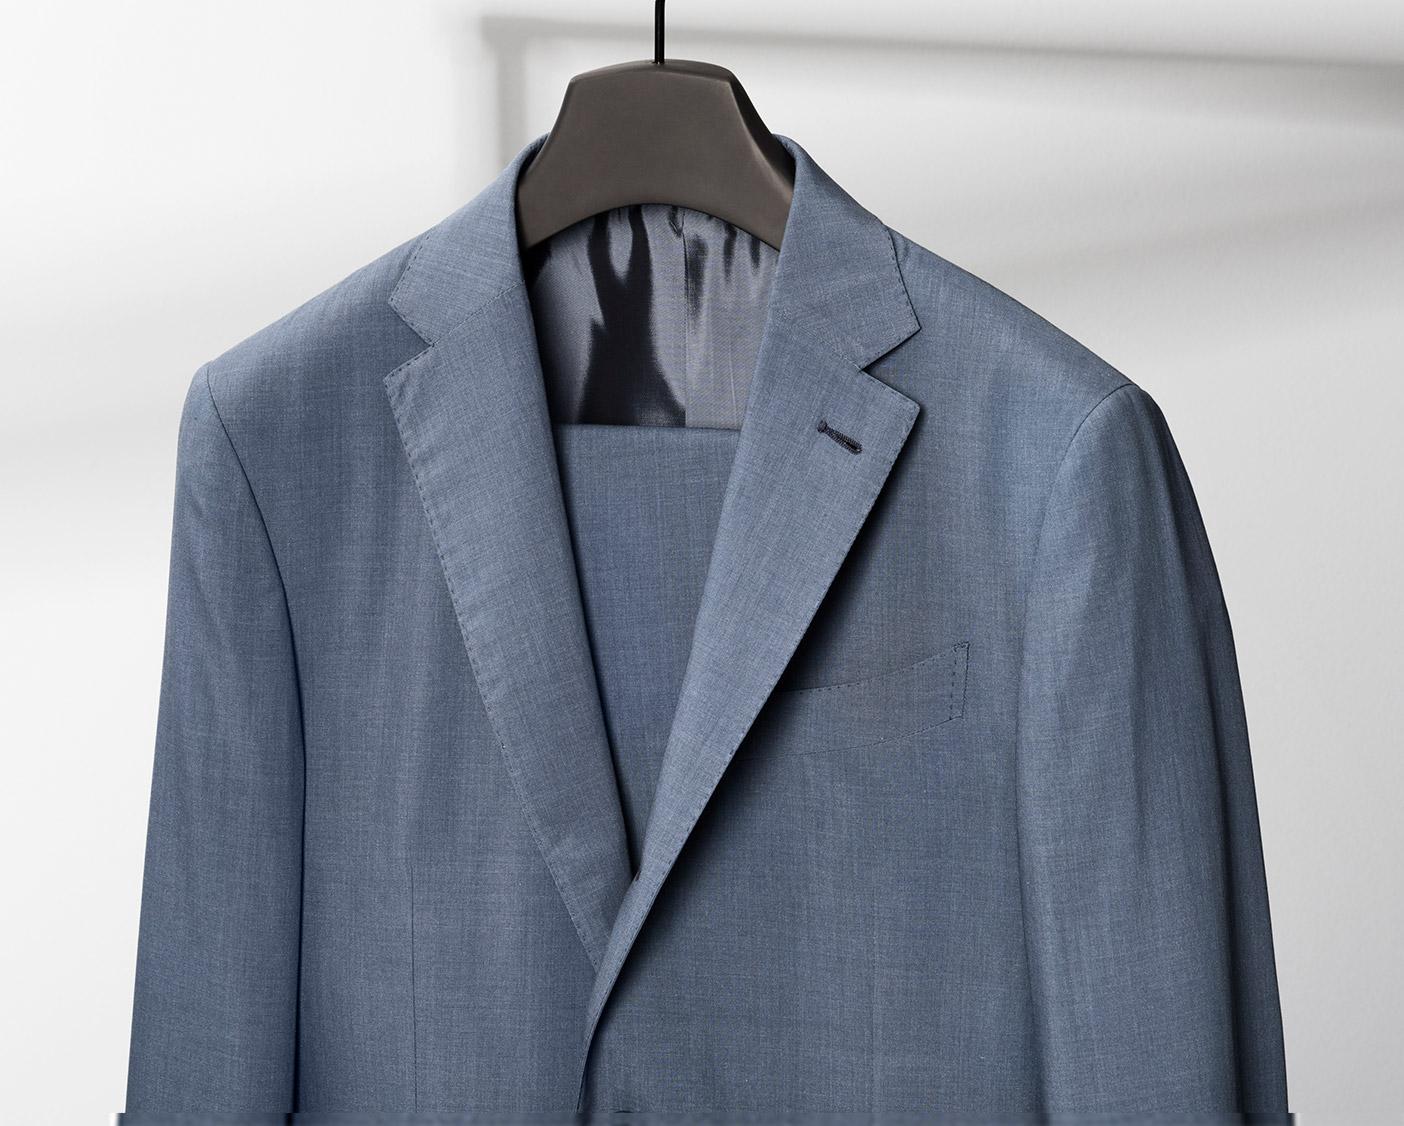 Men's suits and blazers summer sale 2016 | Zegna